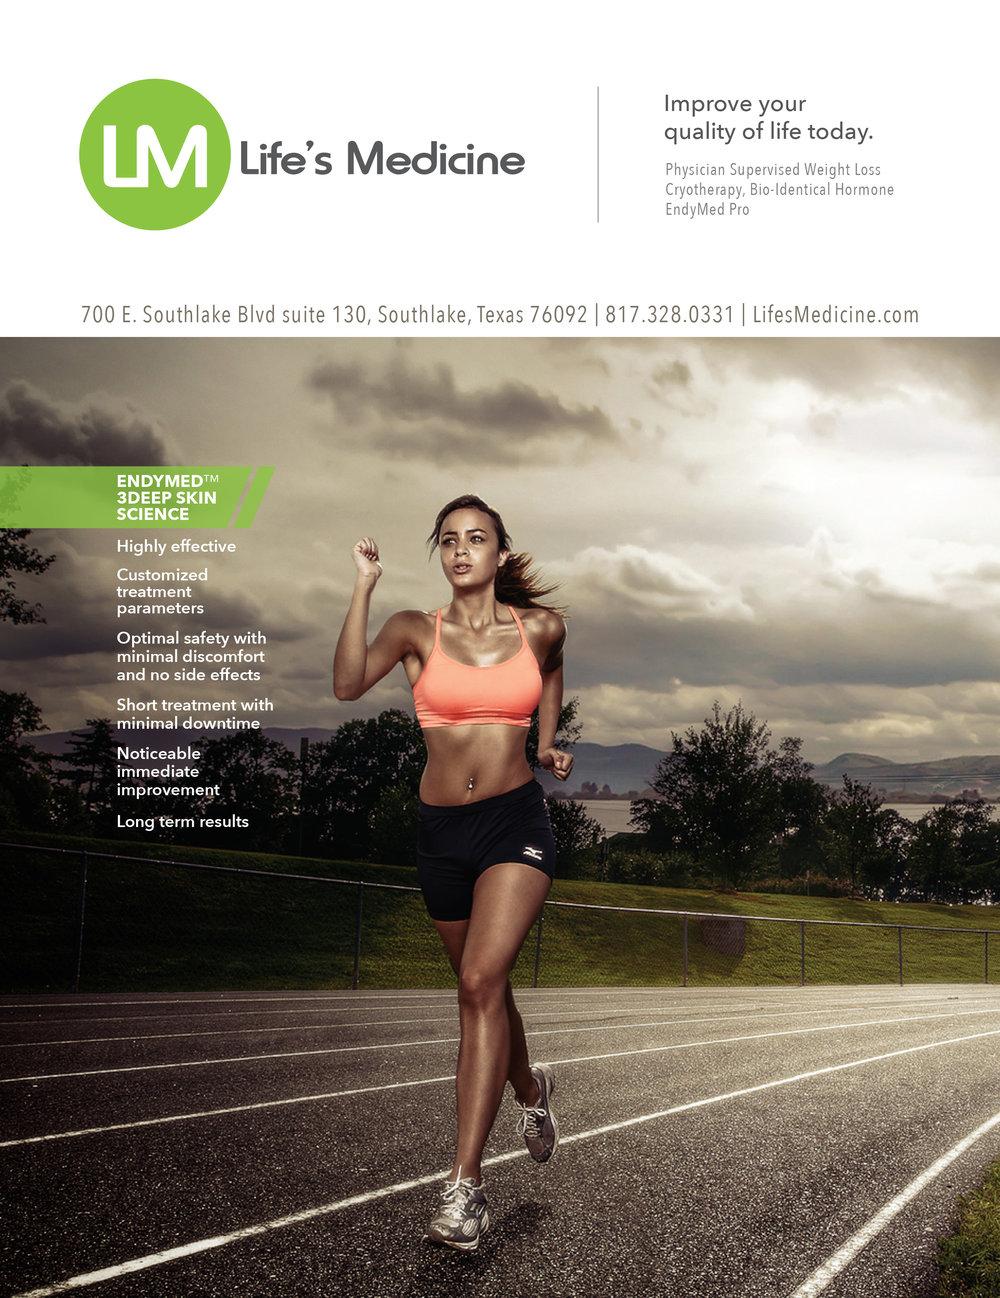 LifesMedicine_FP_DPF16_proof1.jpg